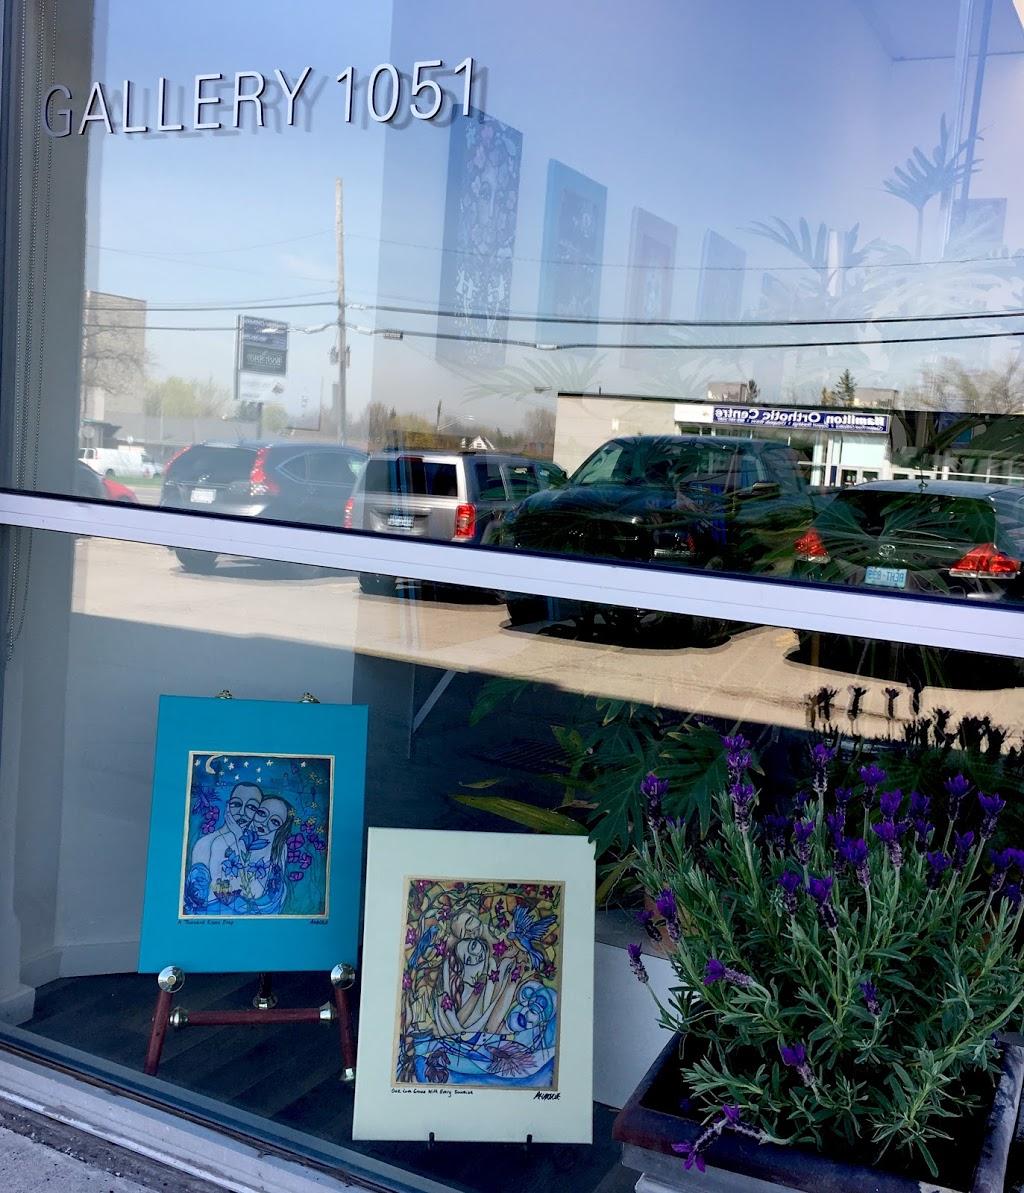 Framing & Art Centre Hamilton   art gallery   1051 Upper James St, Hamilton, ON L9C 3A6, Canada   9053871479 OR +1 905-387-1479